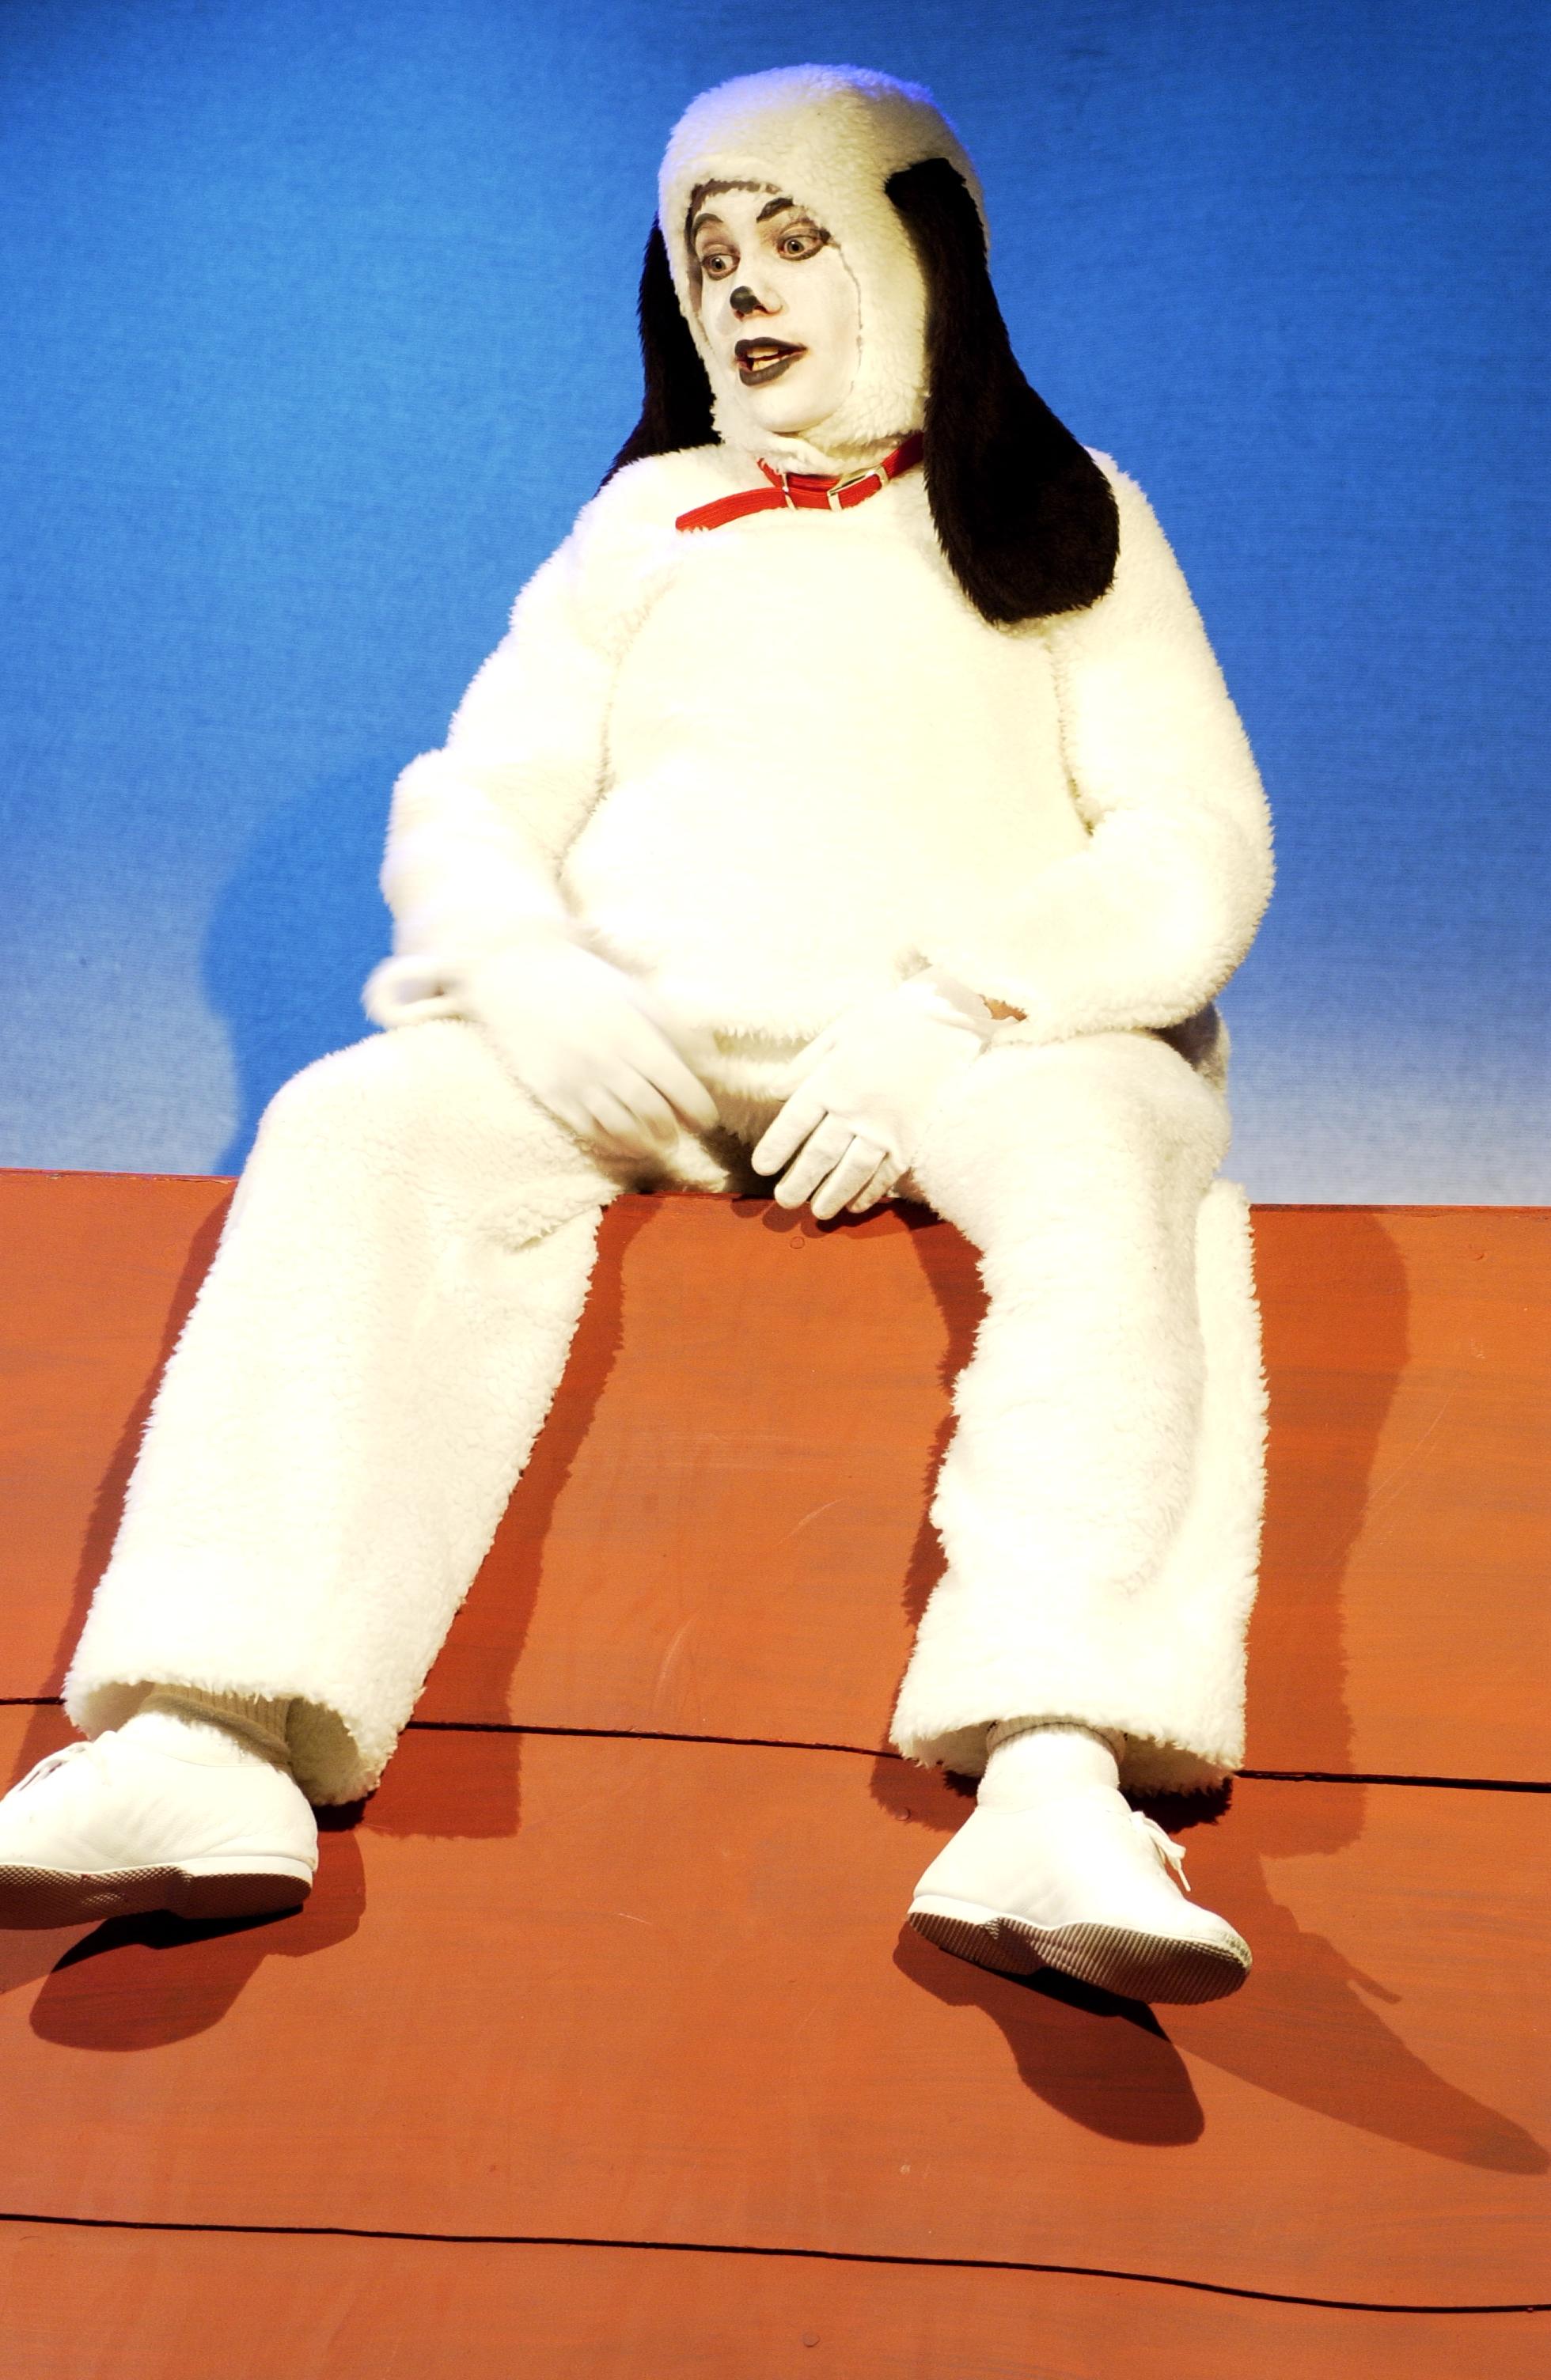 Snoopy - 2003